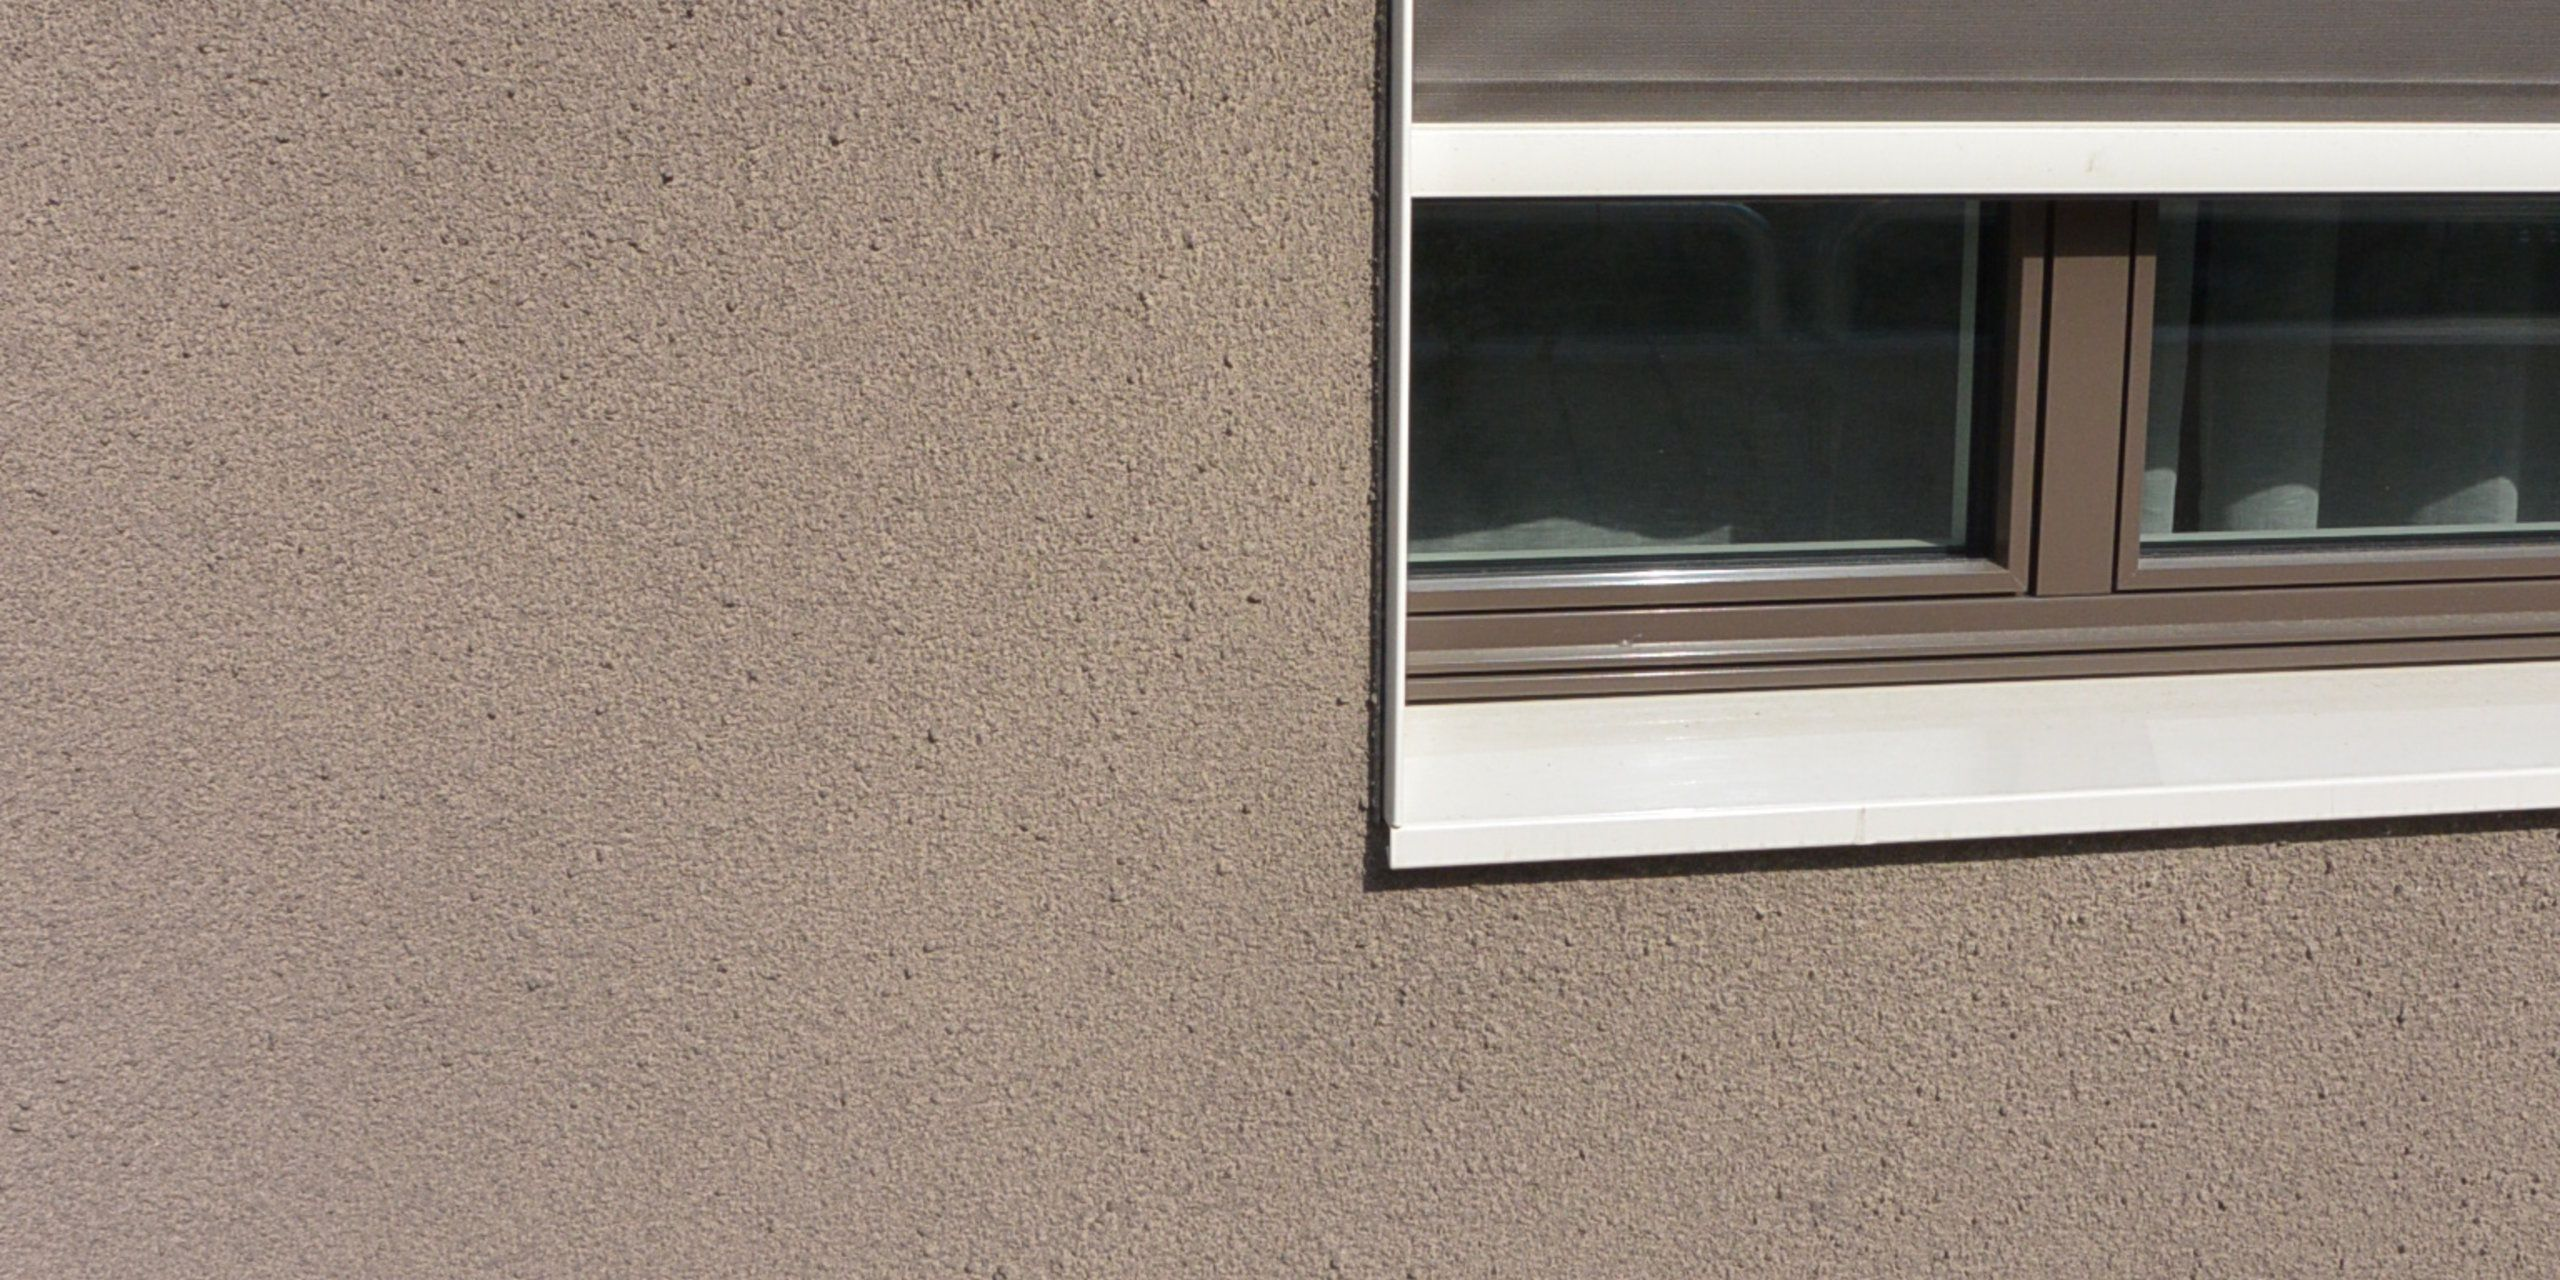 k5 grau mit verputzter fassade fassadensysteme w rmed mmsysteme hinterl ftete fassade. Black Bedroom Furniture Sets. Home Design Ideas